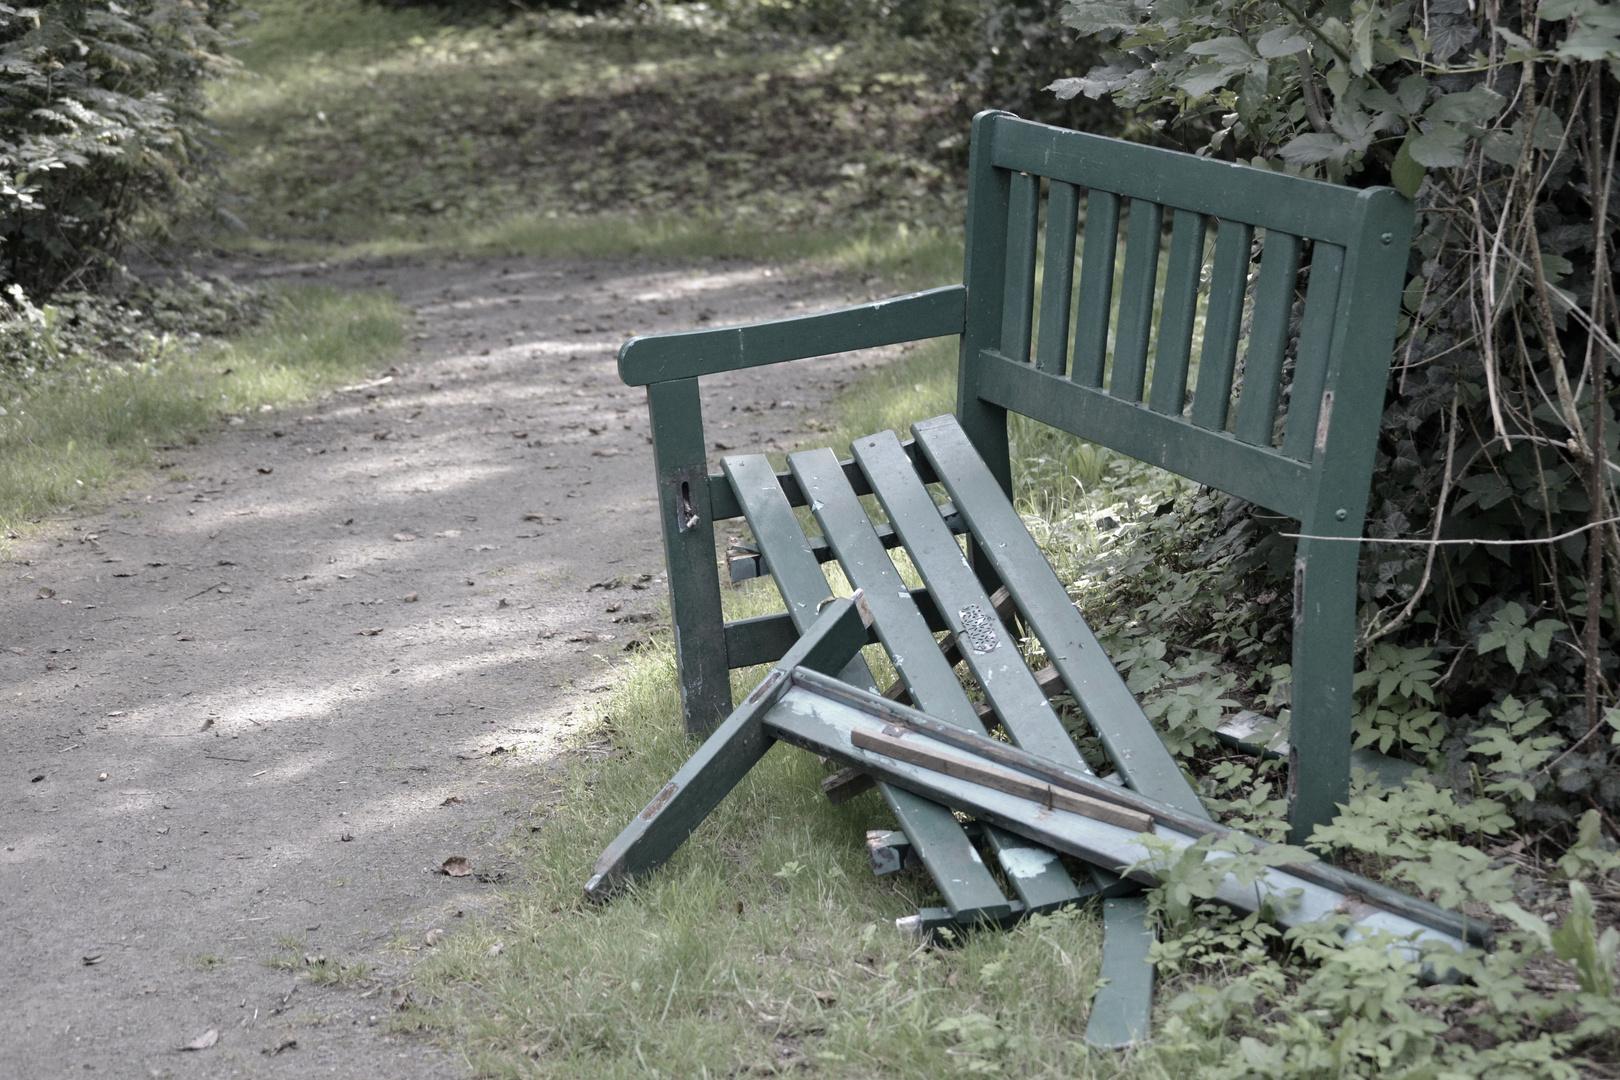 die gute alte gartenbank foto bild landschaft b nke in der landschaft z une b nke. Black Bedroom Furniture Sets. Home Design Ideas